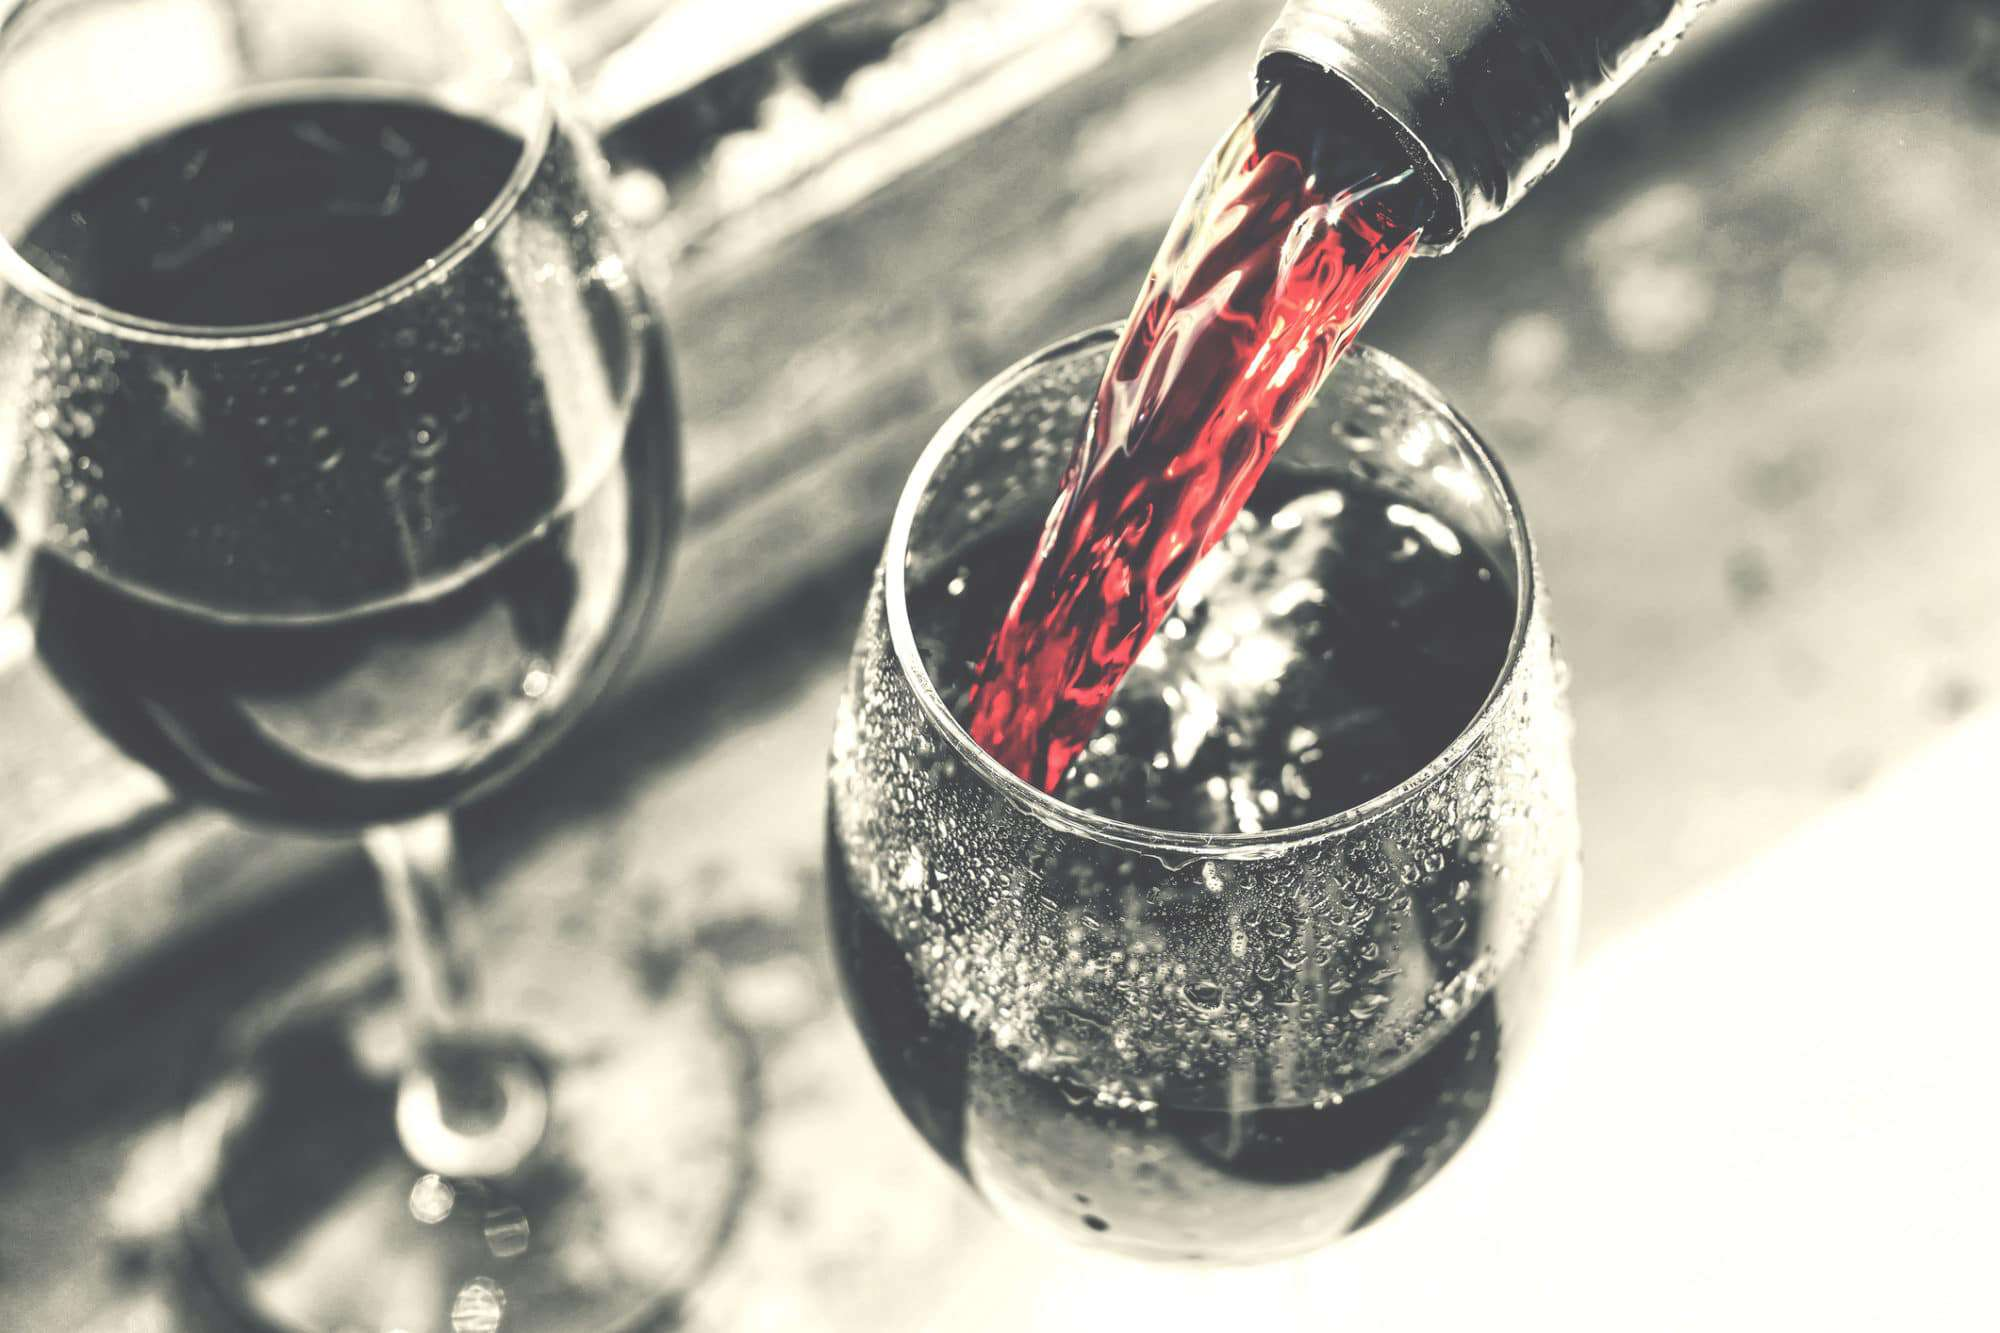 Louis Martini Cabarnet Souvignon red wine, types of red wine